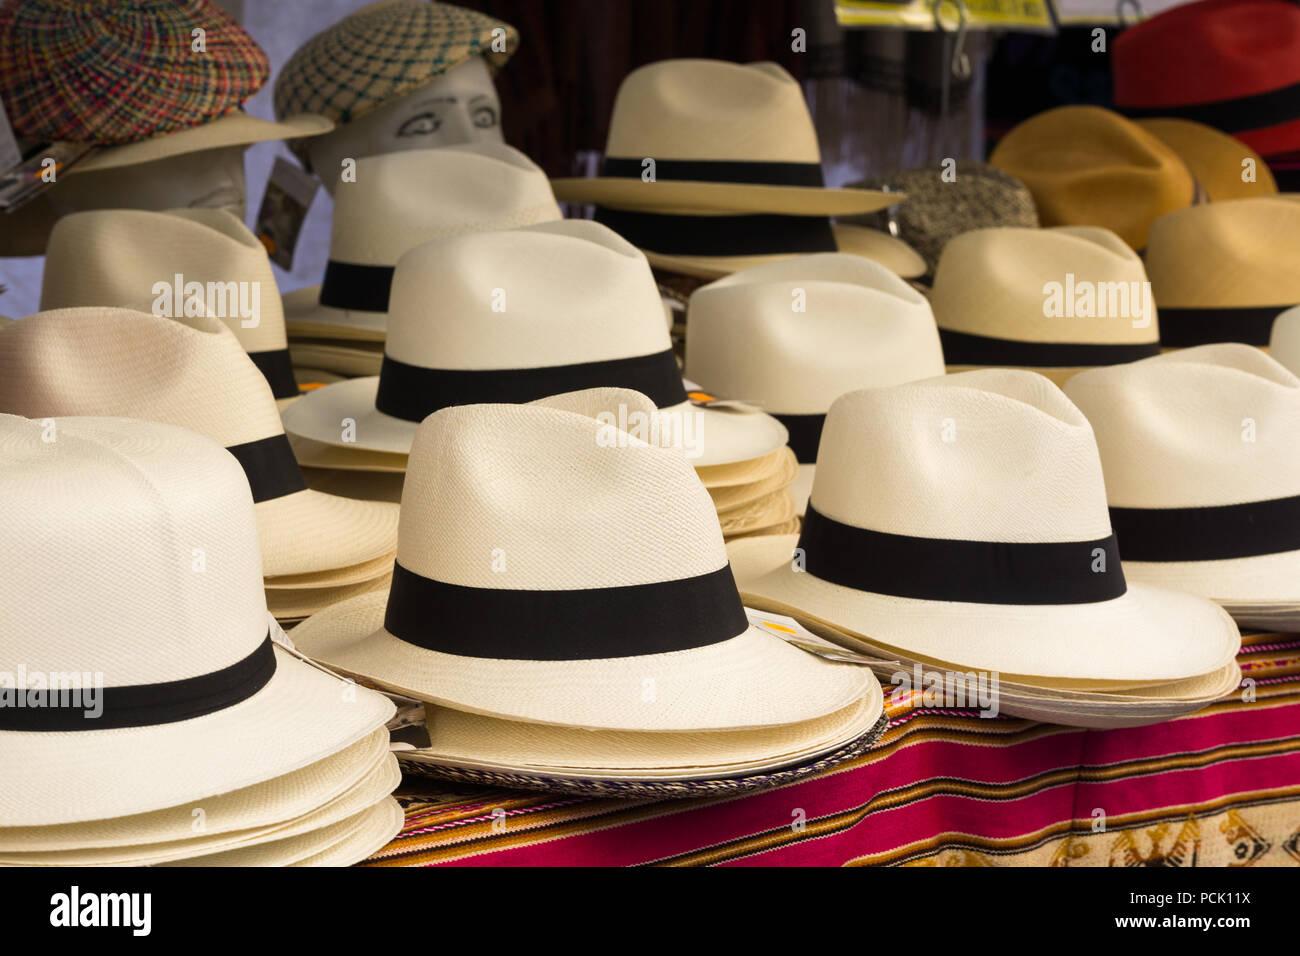 a77bd745acda9 Panama Hat Hats Imágenes De Stock   Panama Hat Hats Fotos De Stock ...